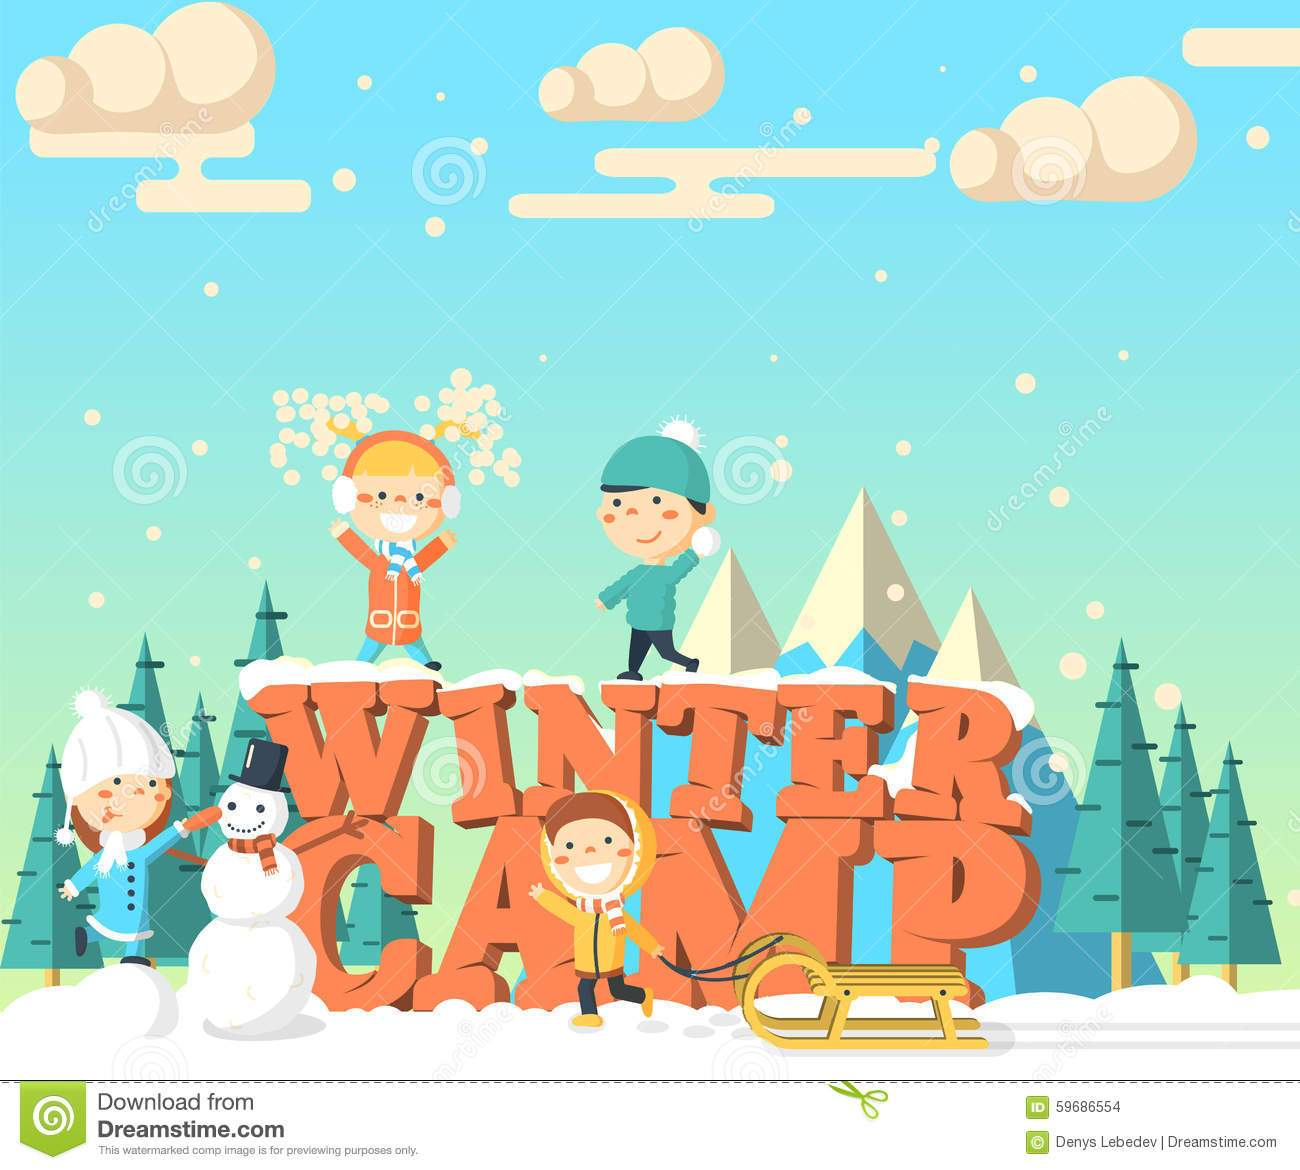 Winter clipart camp. Camping portal